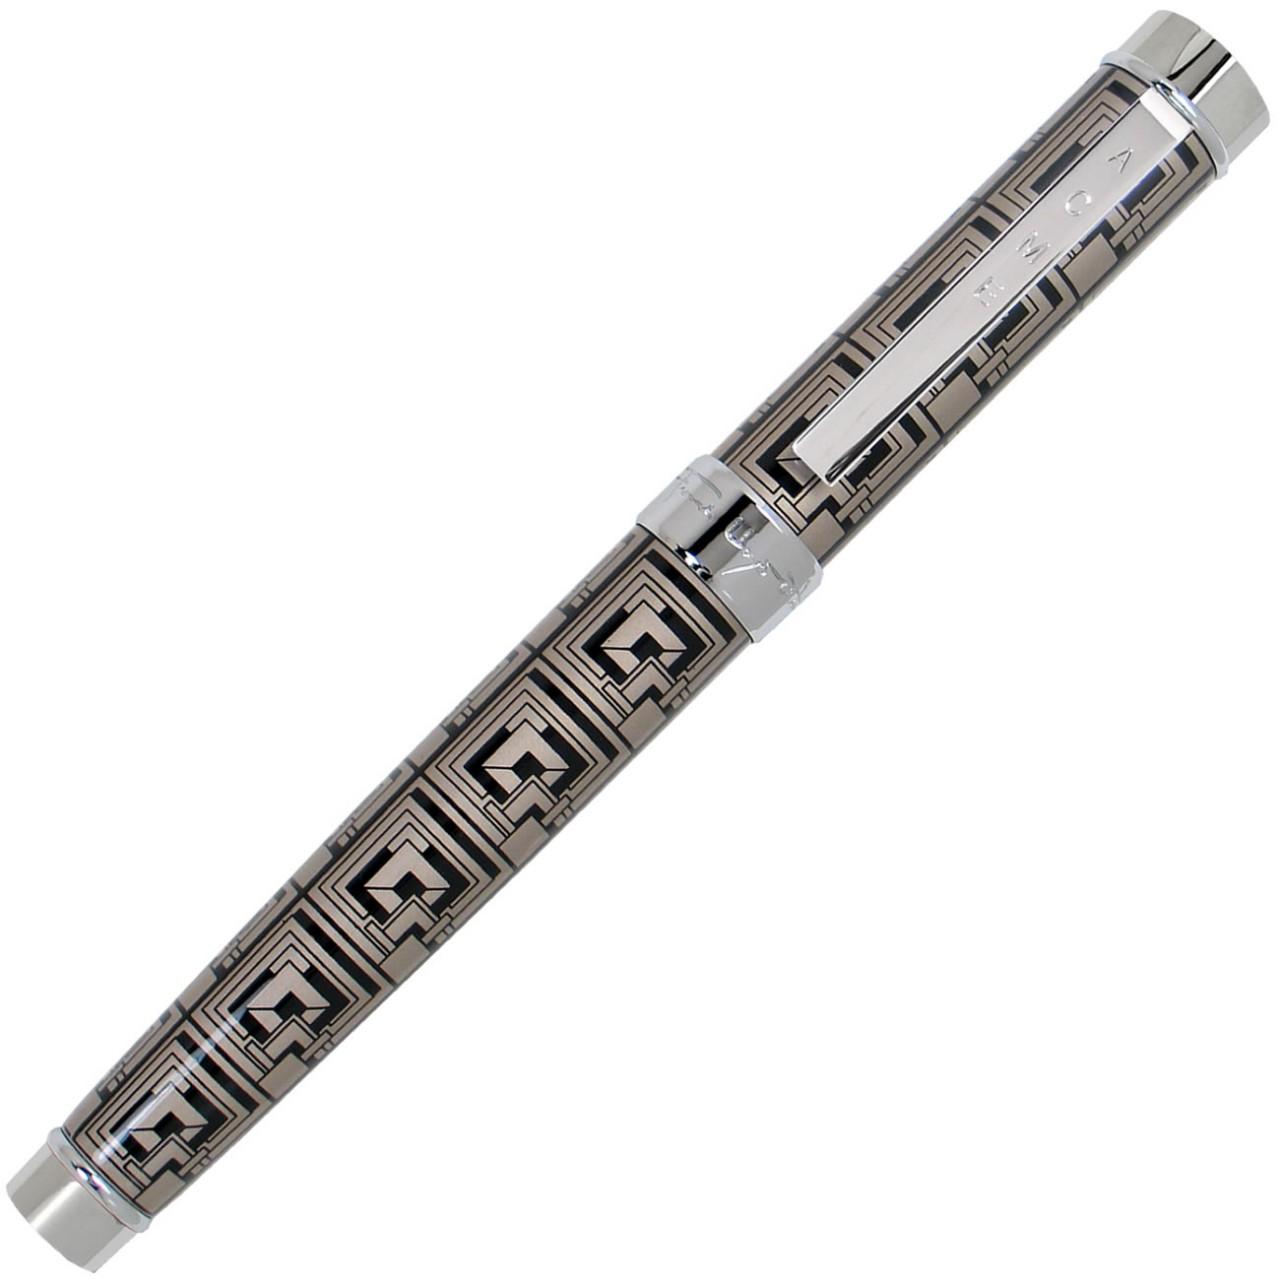 ACME Brick Standard Roller